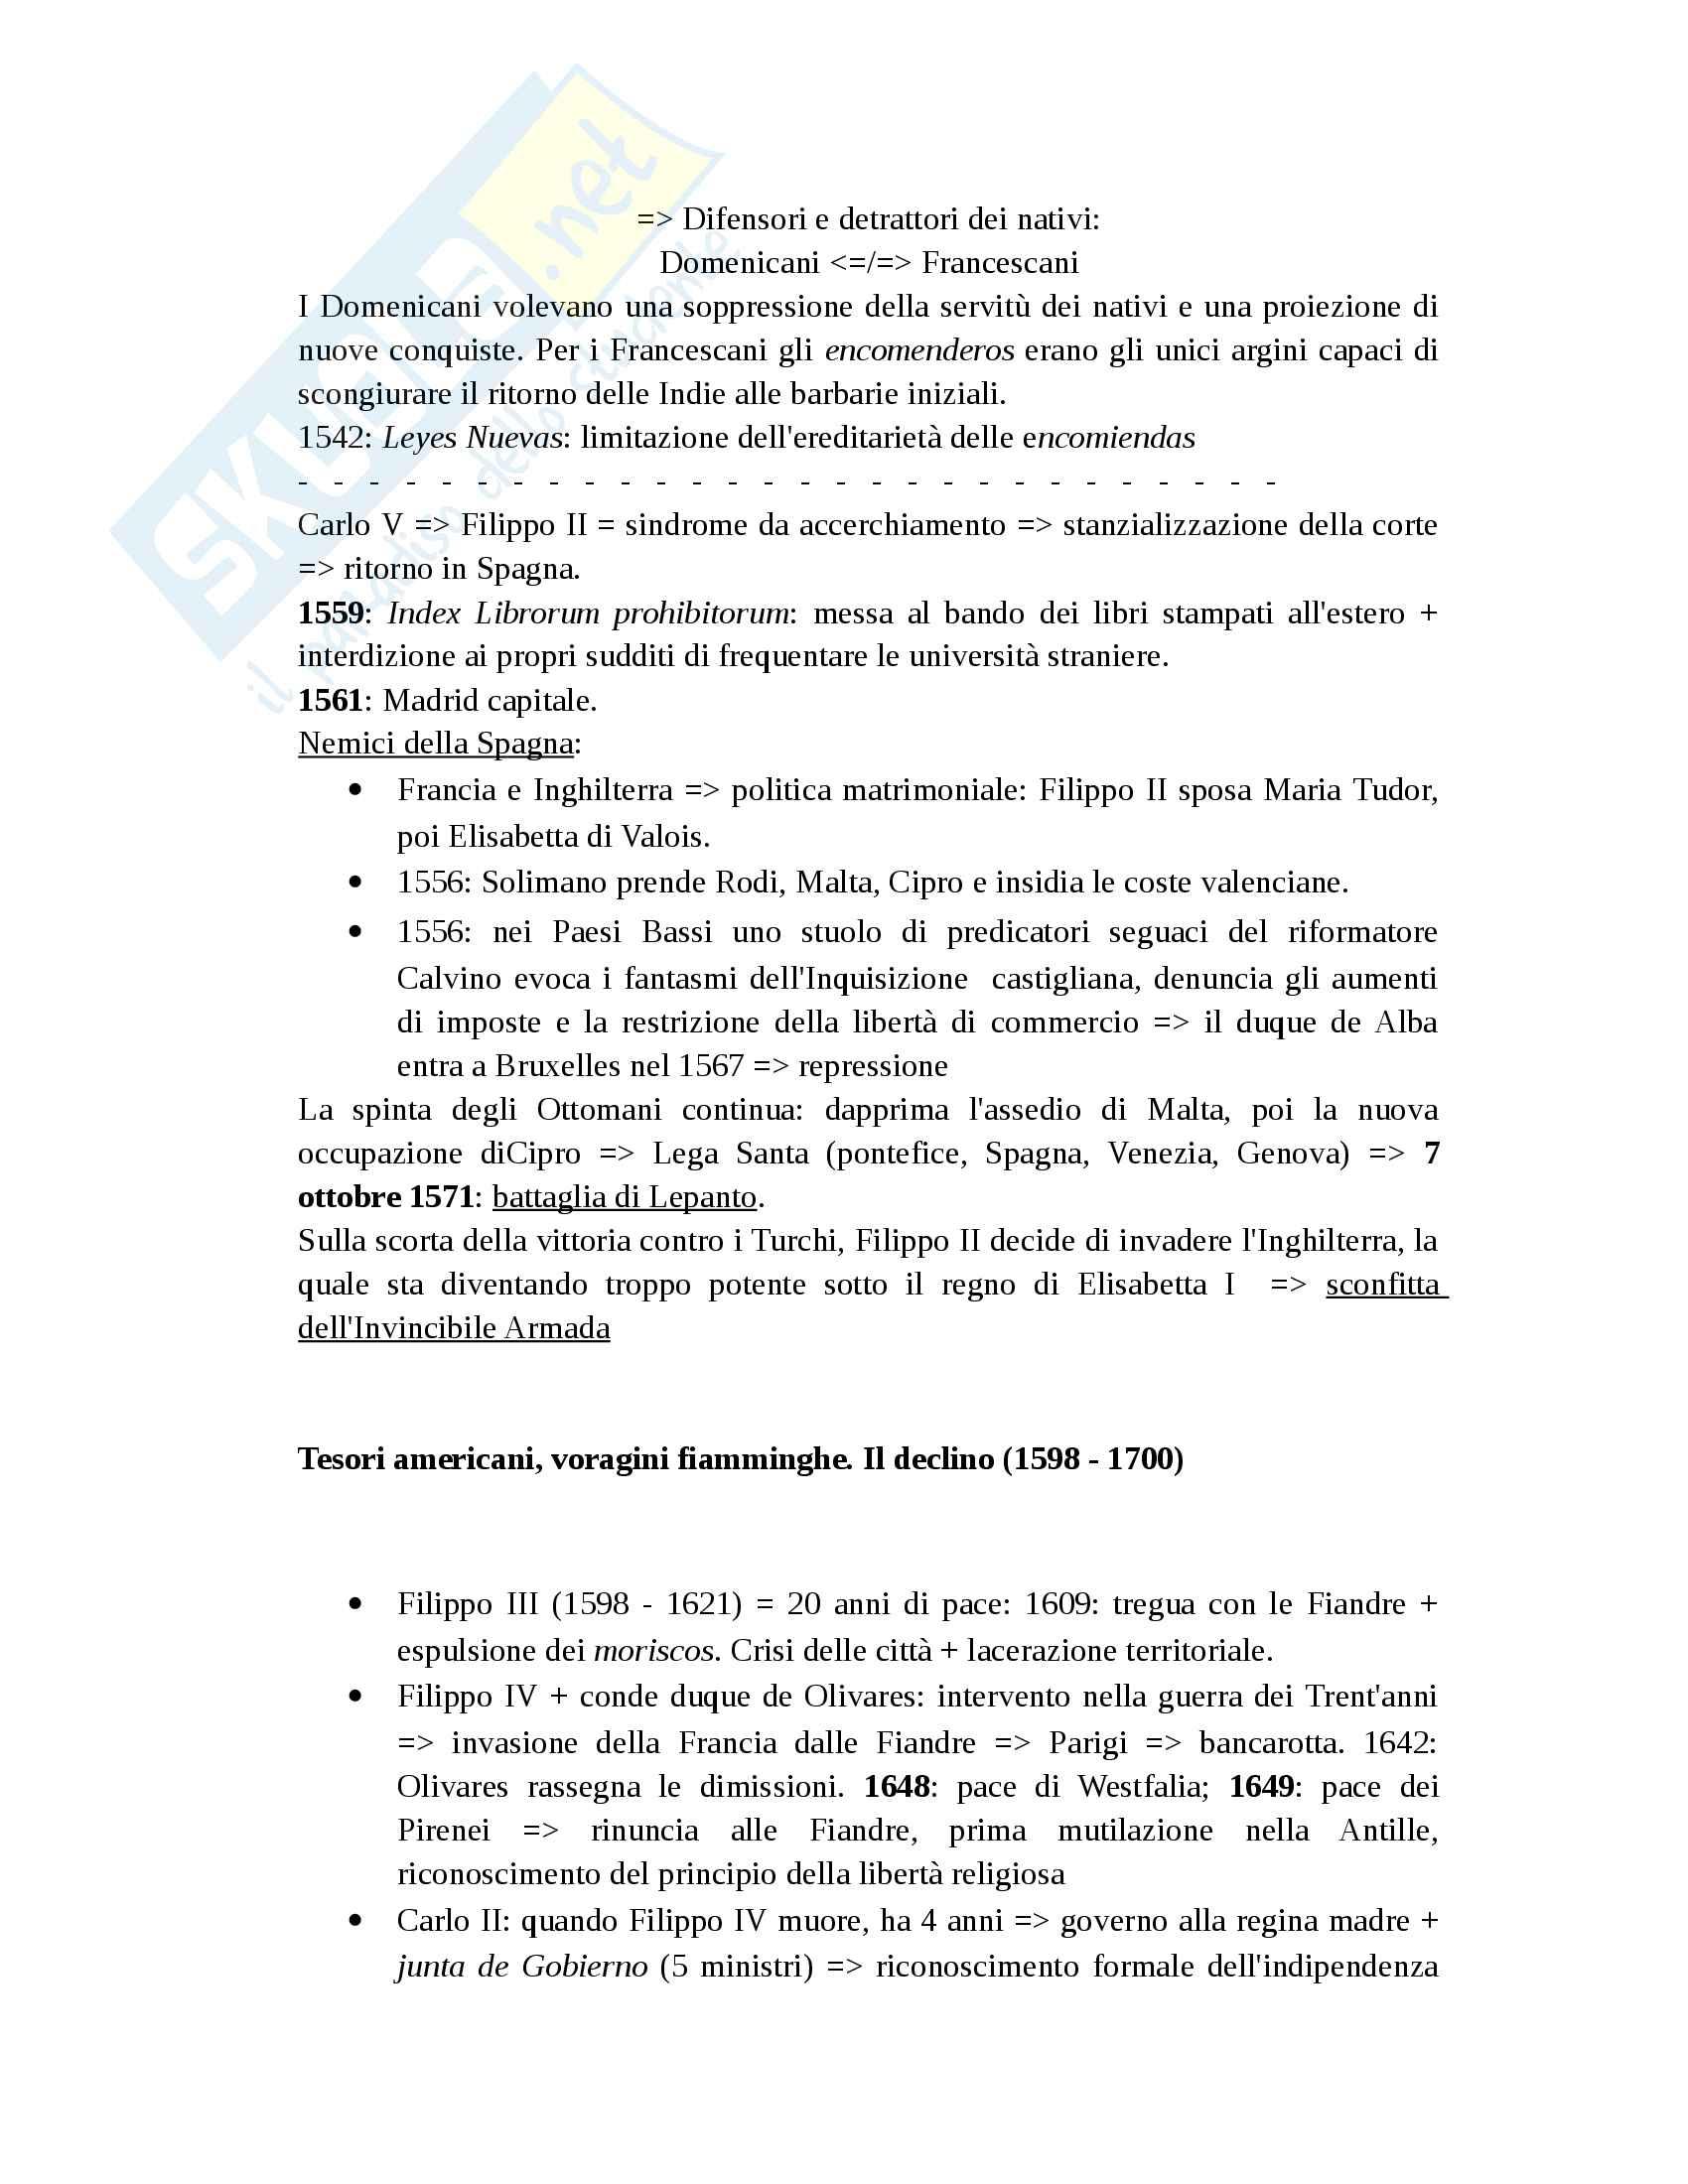 Storia di Spagna (riassunto schematico) Pag. 6